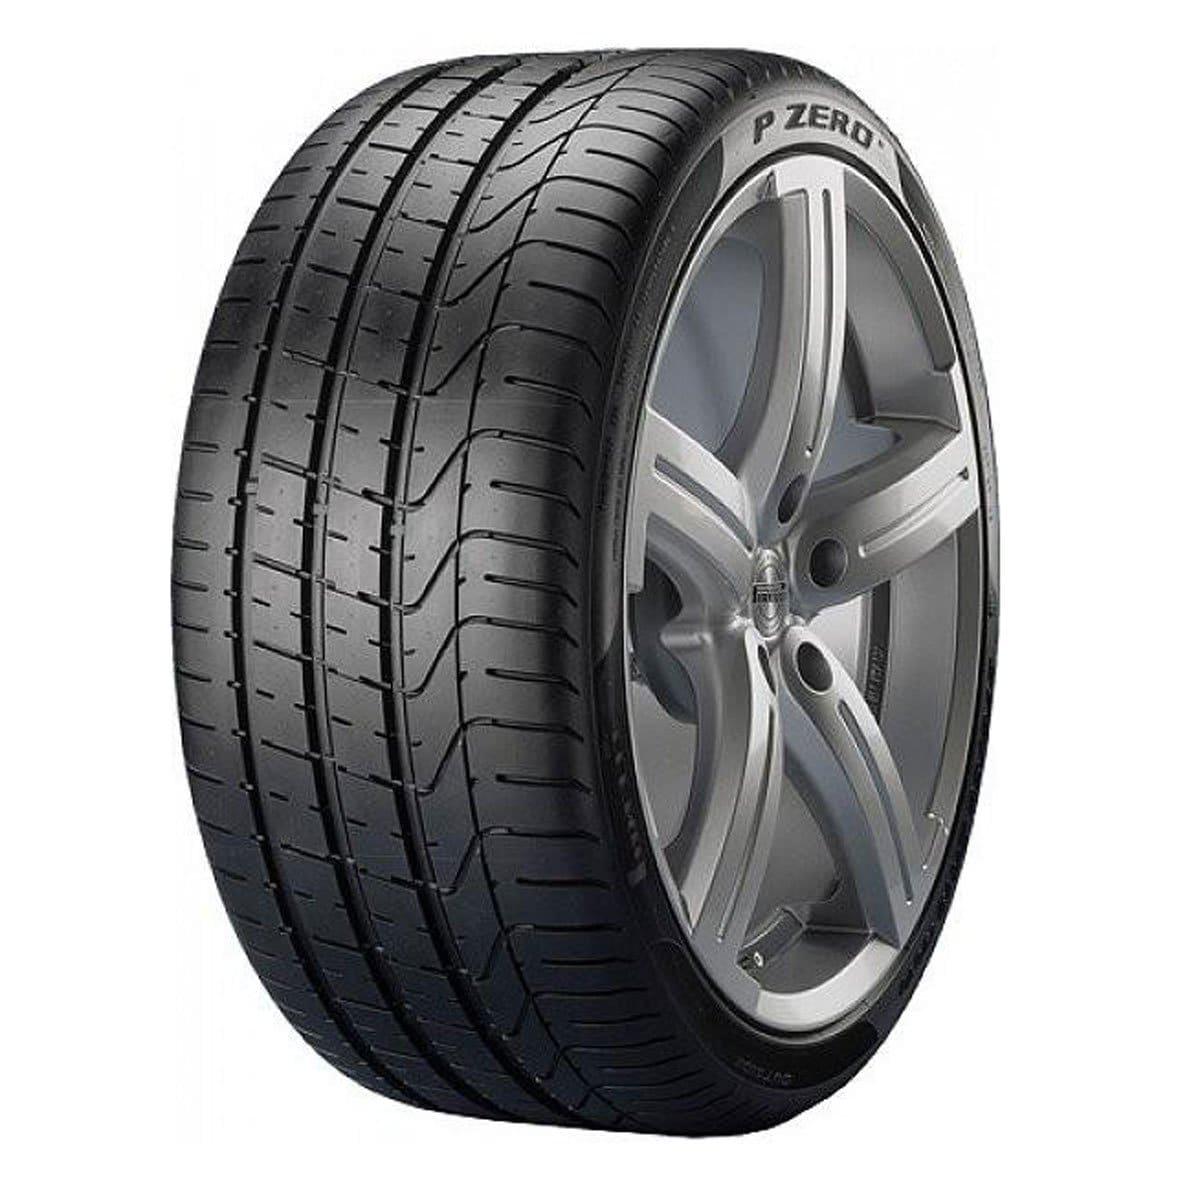 Spllanta 245 40 Zr19 Pzero 94Y 1638200 Pirelli